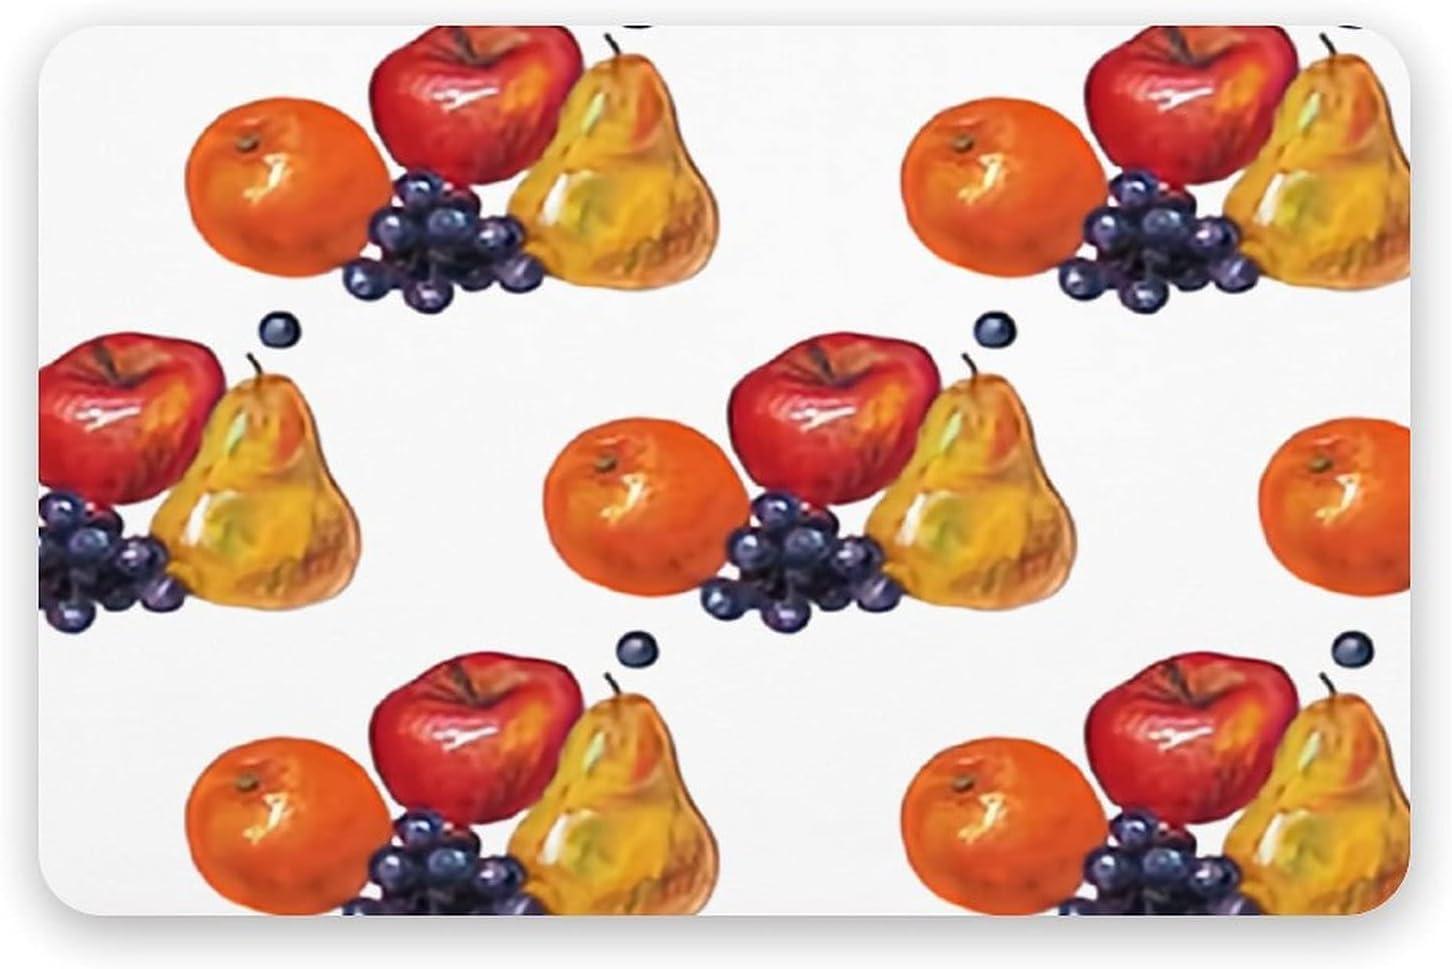 PotteLove Still Life Yellow pear Max 69% OFF Bath - Diatomaceous Al sold out. Grape Earth